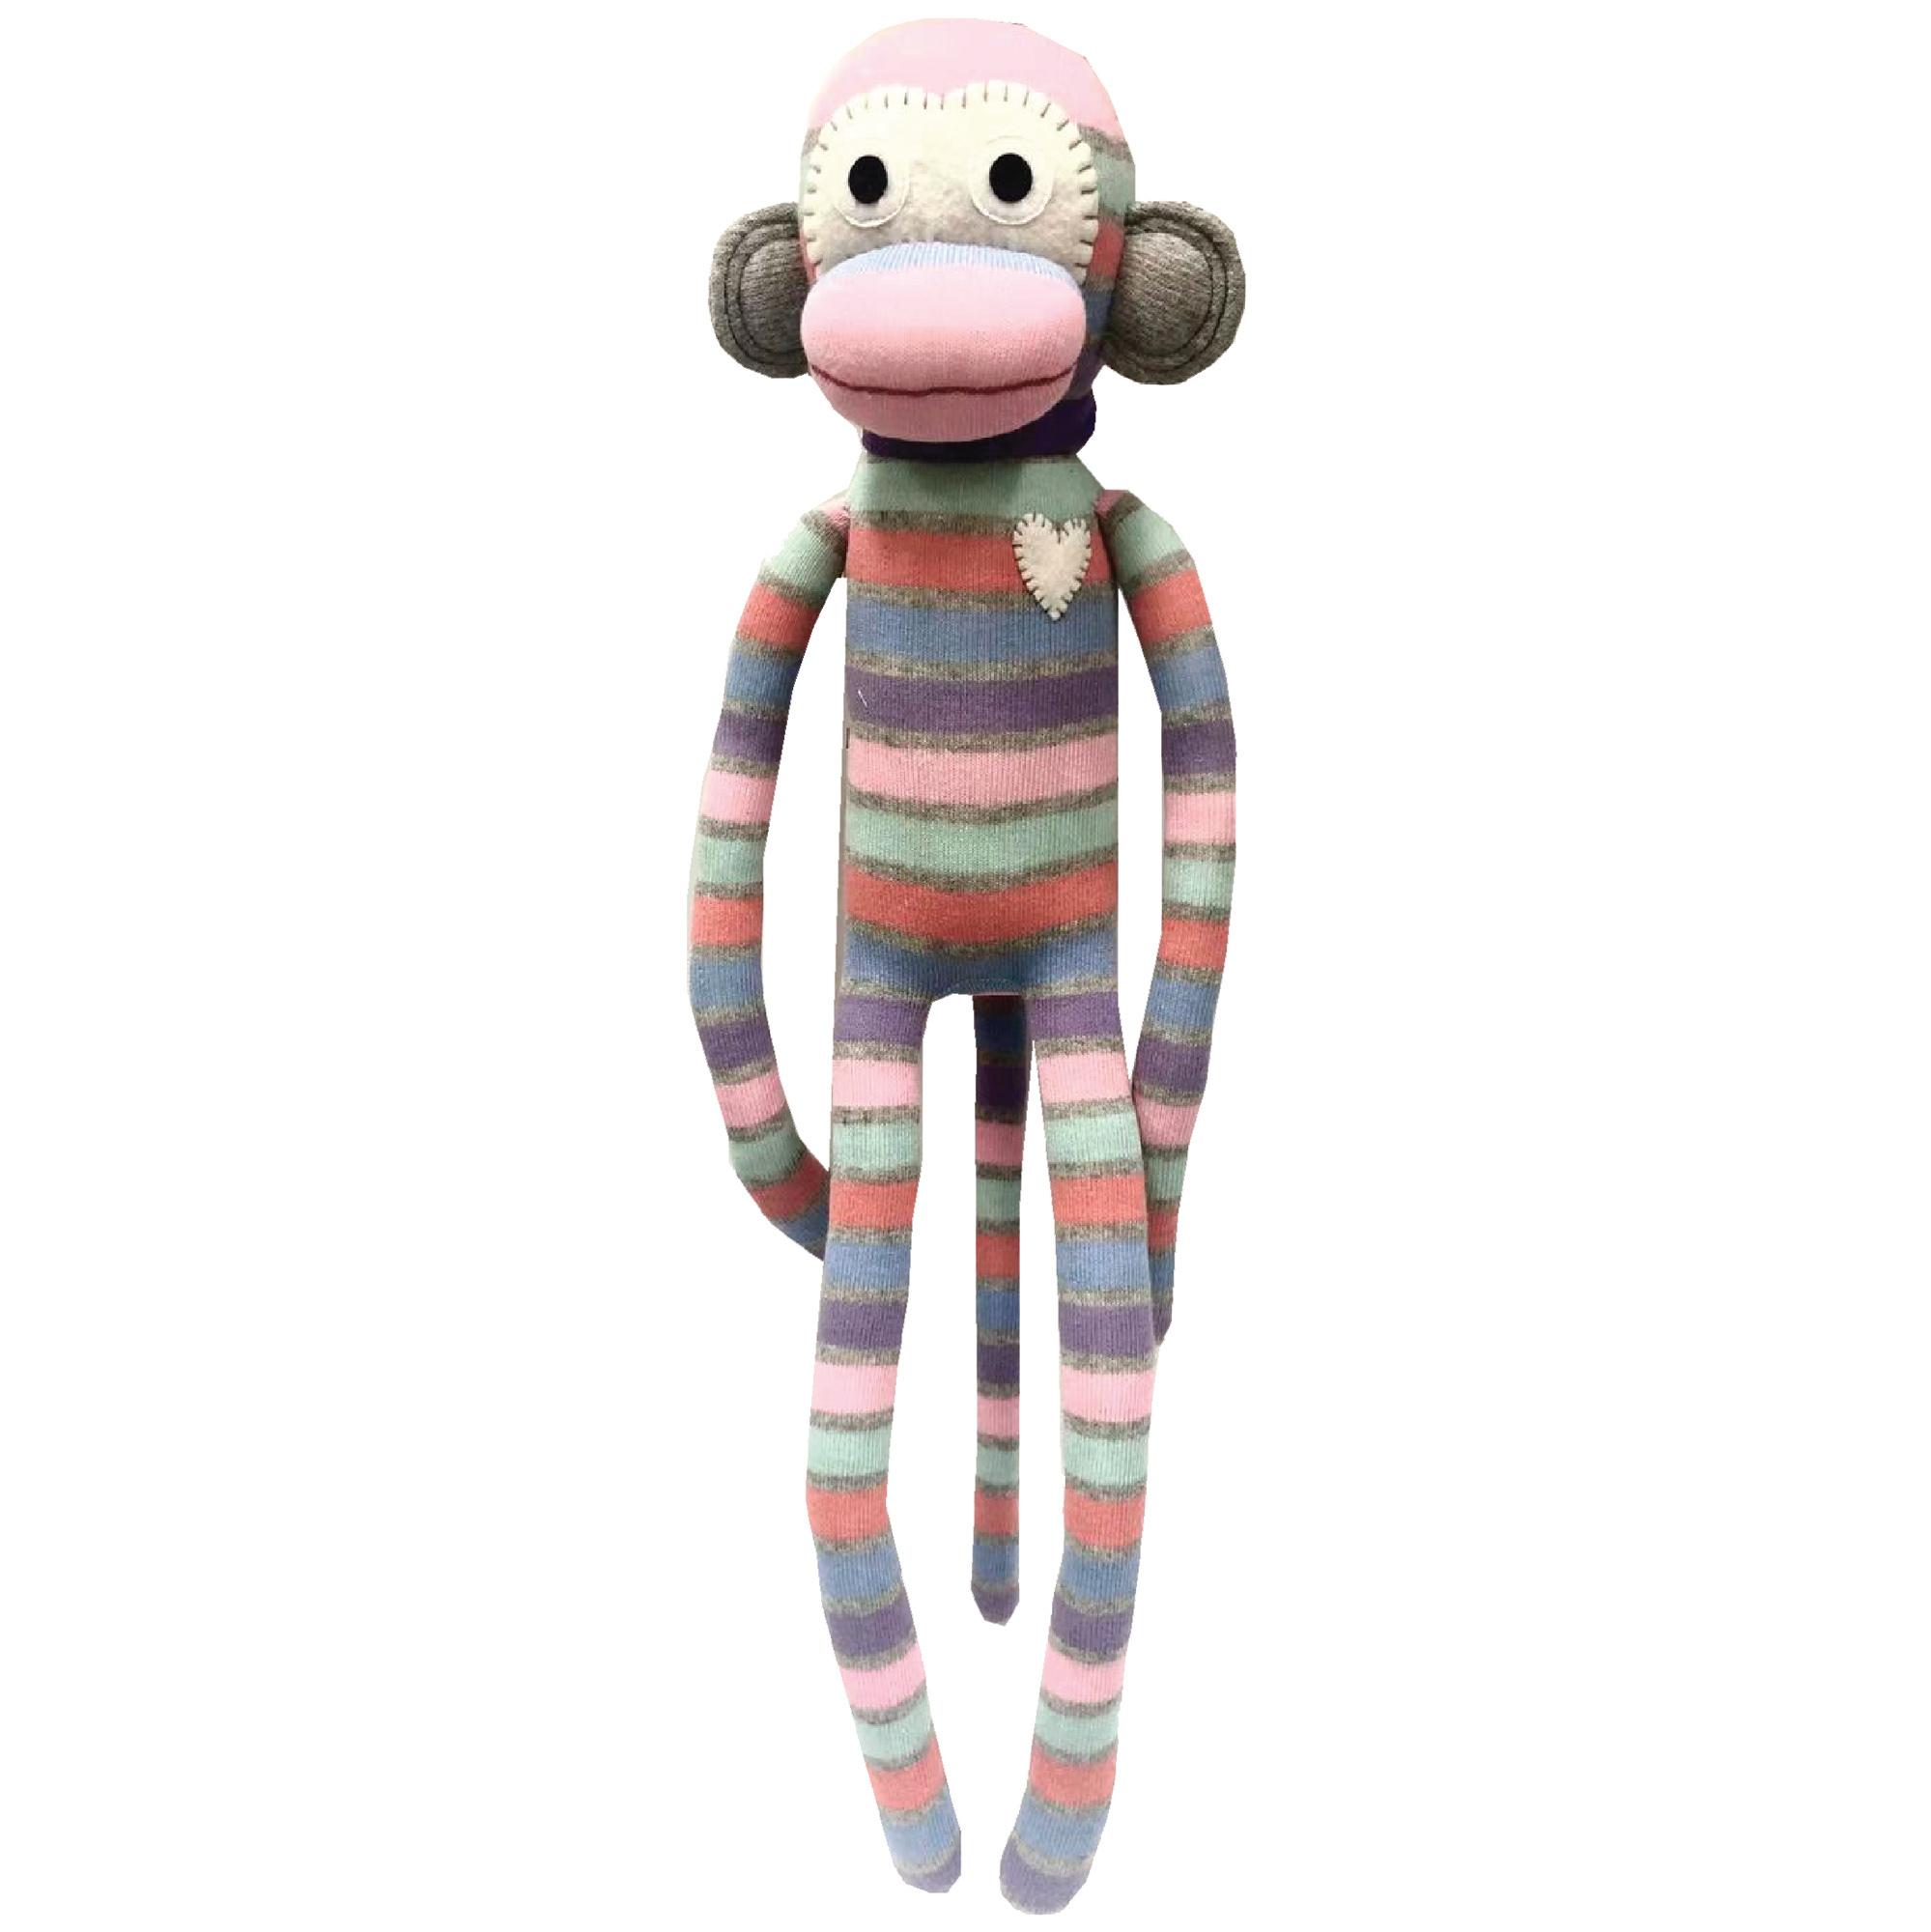 Boyle Zoe The Sock Monkey Plush Toy Reviews Temple Webster